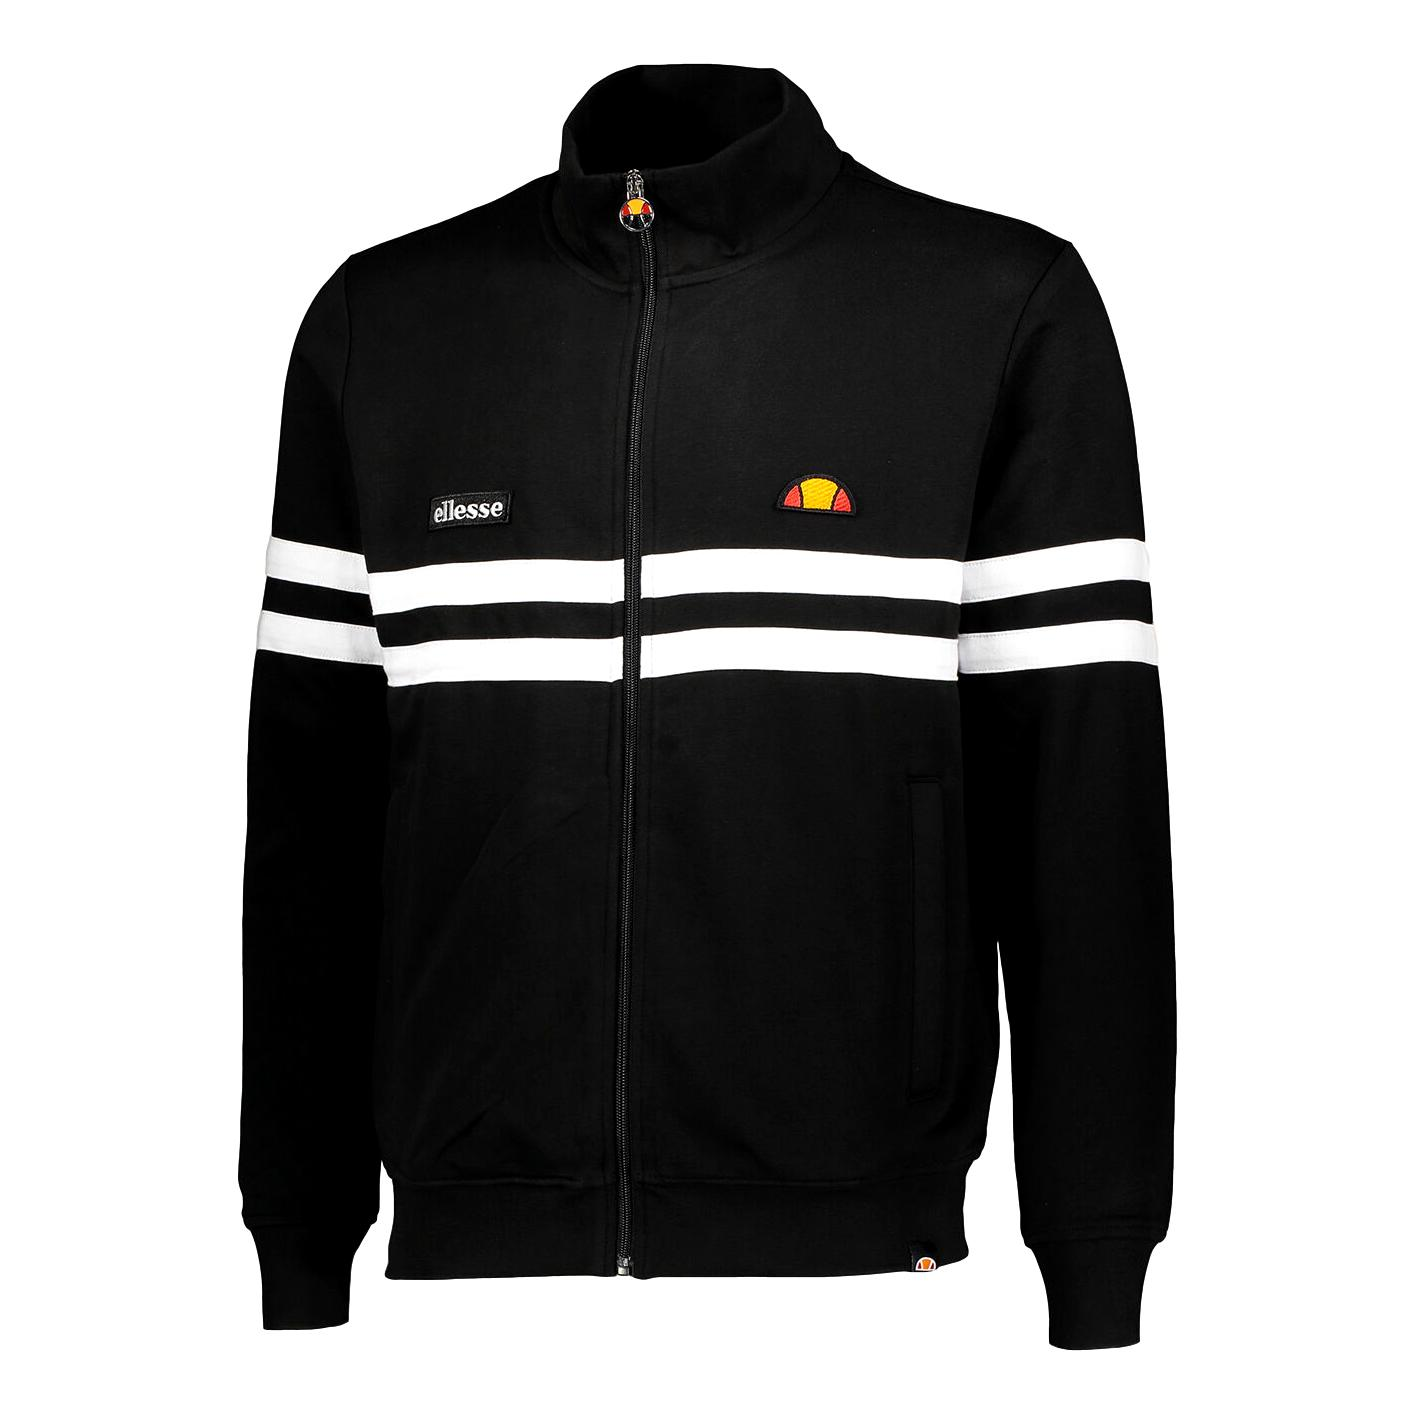 rimini sweatshirt ELLESSE |  | EHM211S21050